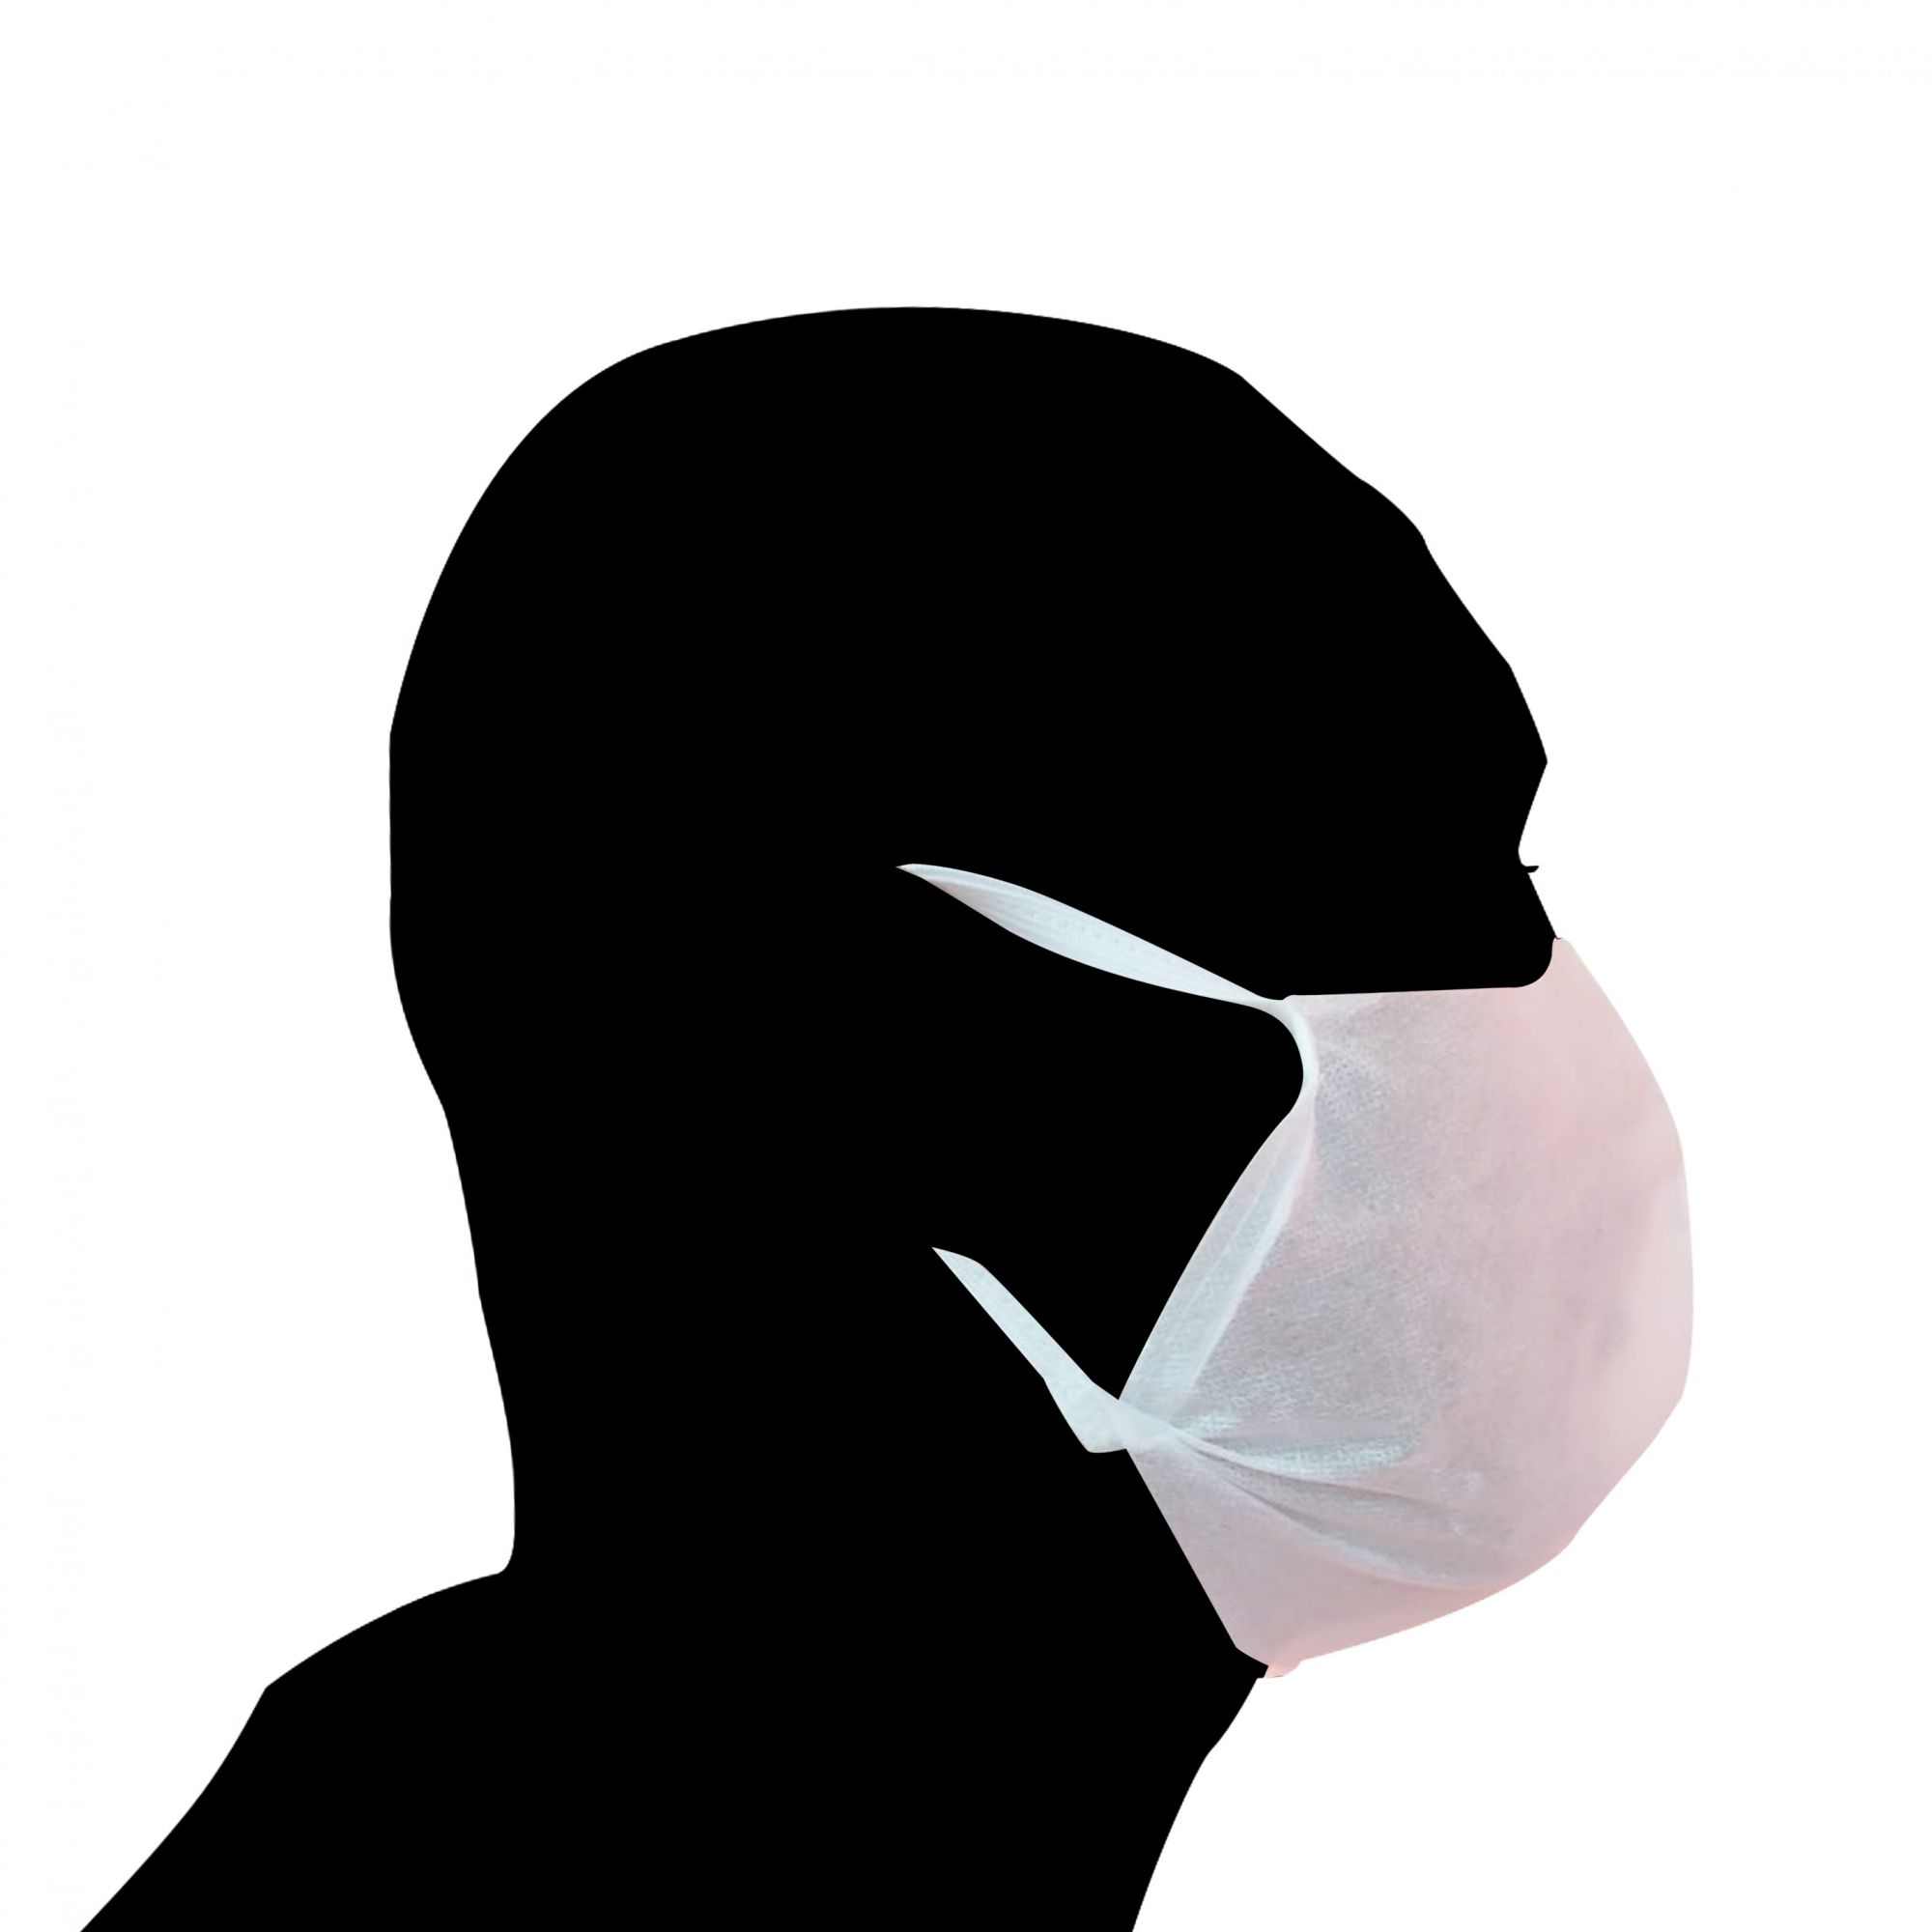 Máscara Cirúrgica Descartável TNT